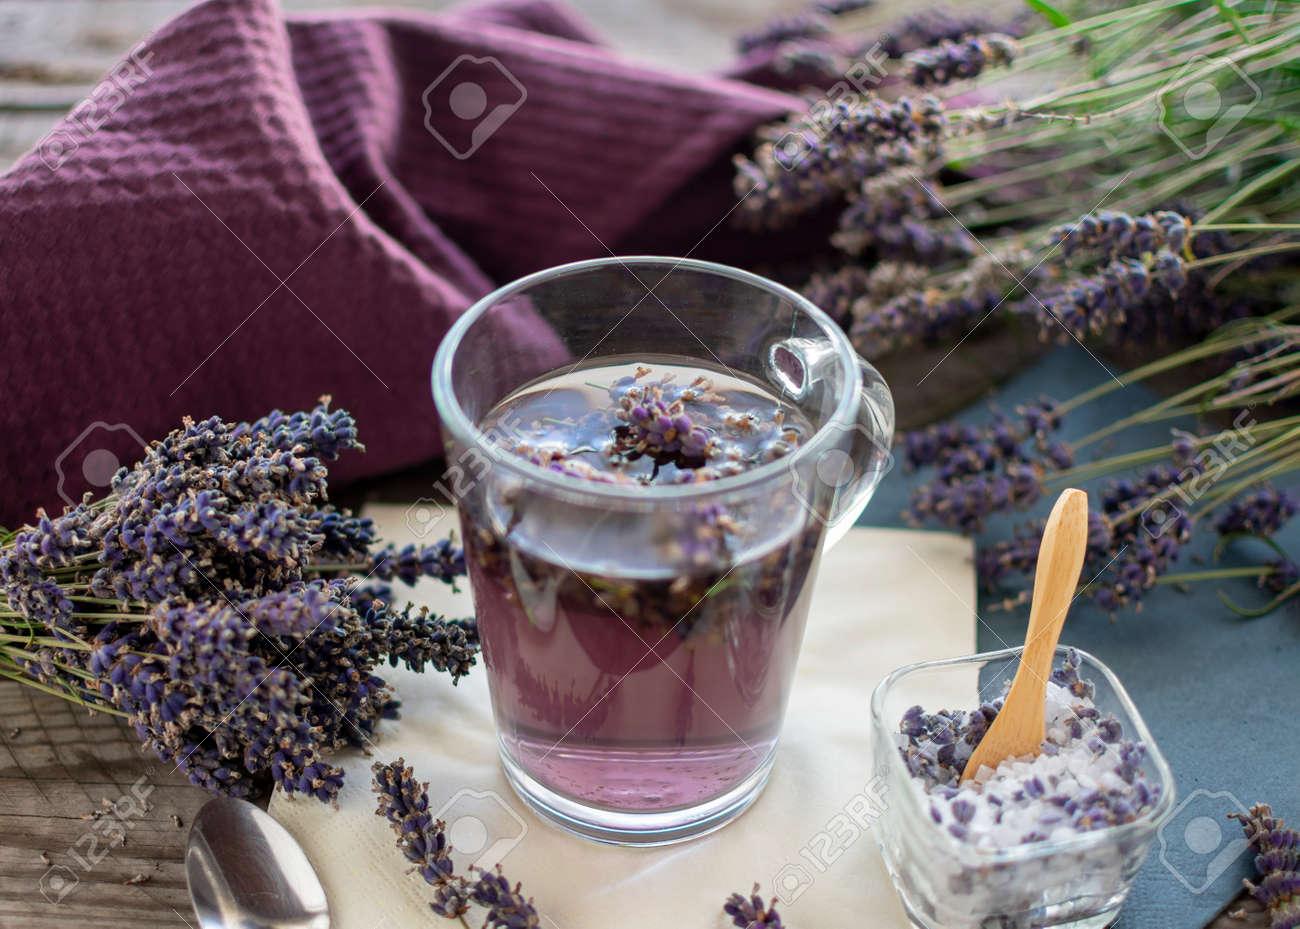 fresh lavender tea with lavender sugar. Lavender (Lavandula angustifolia), has a calming and antispasmodic effect. - 152468044